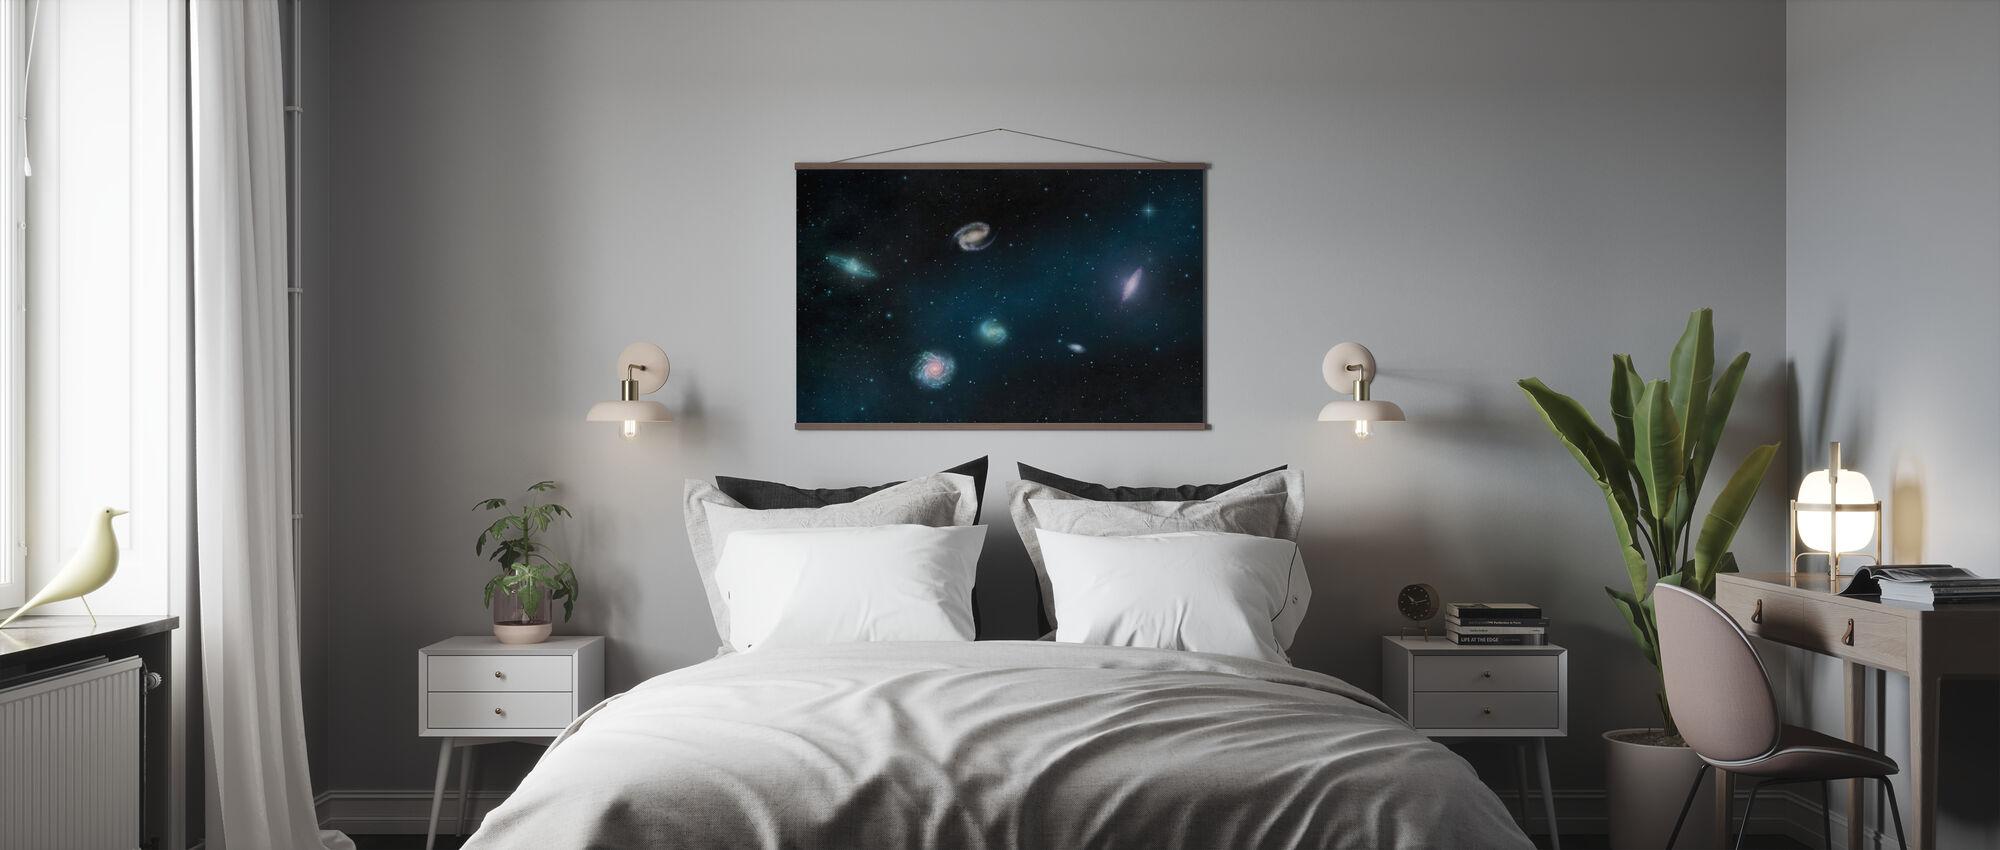 Darkest Dark - Galaxies - Poster - Bedroom